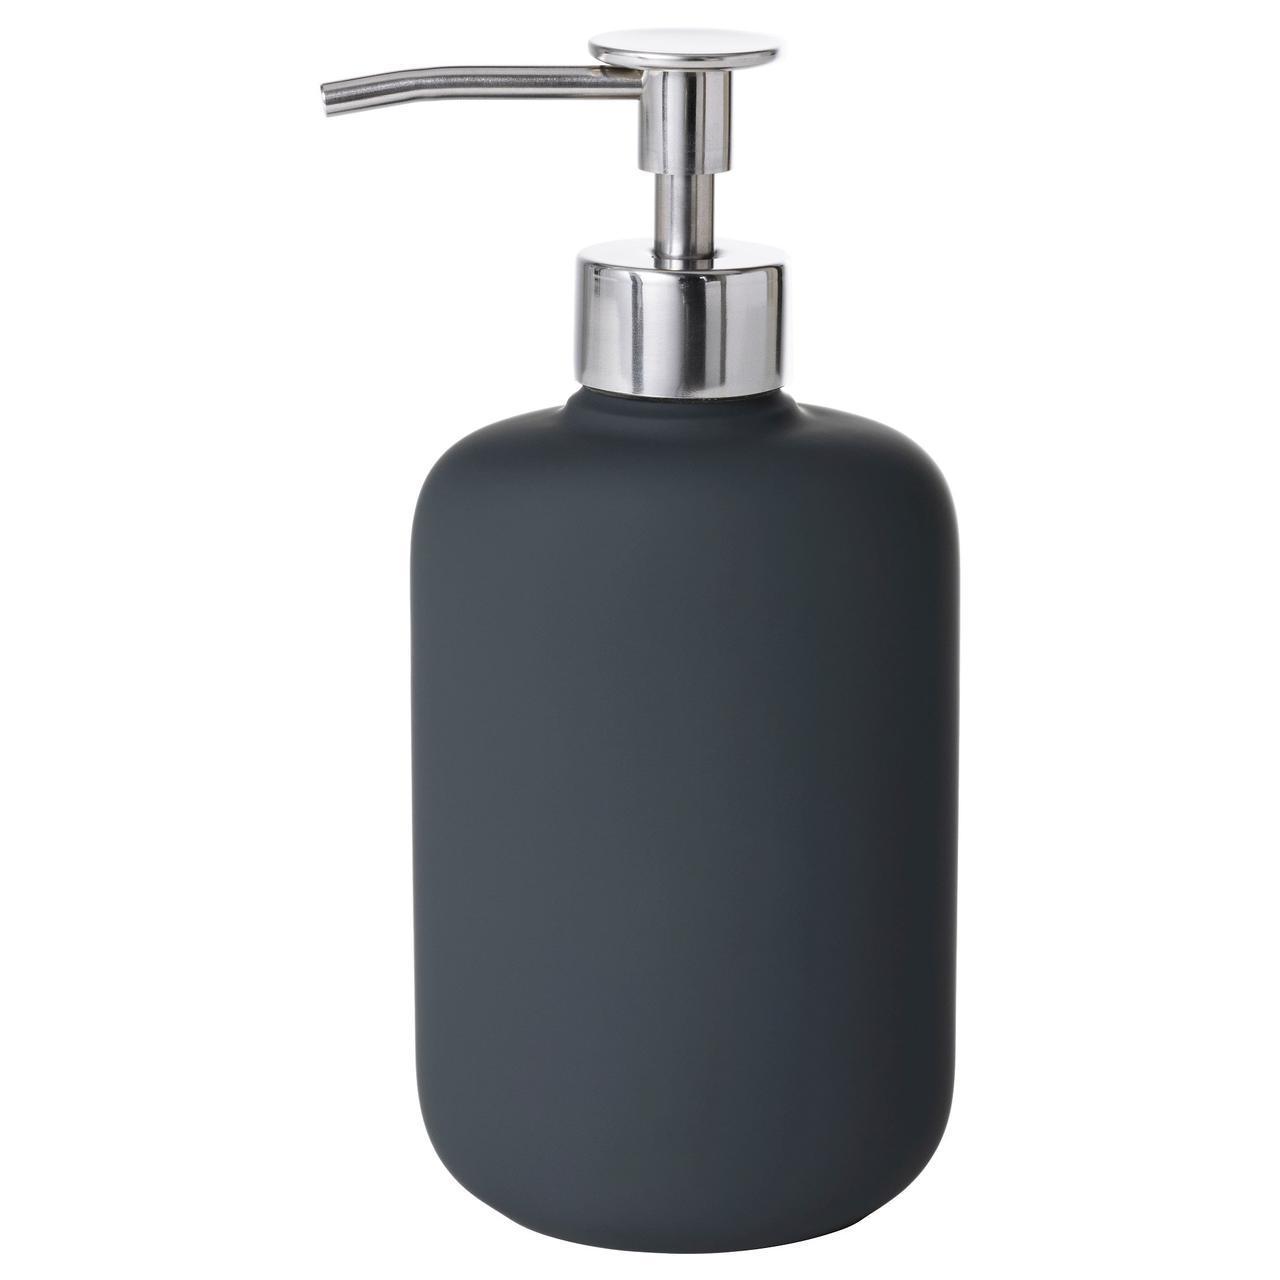 IKEA EKOLN (602.915.10) Диспенсер для мыла, темно-серый